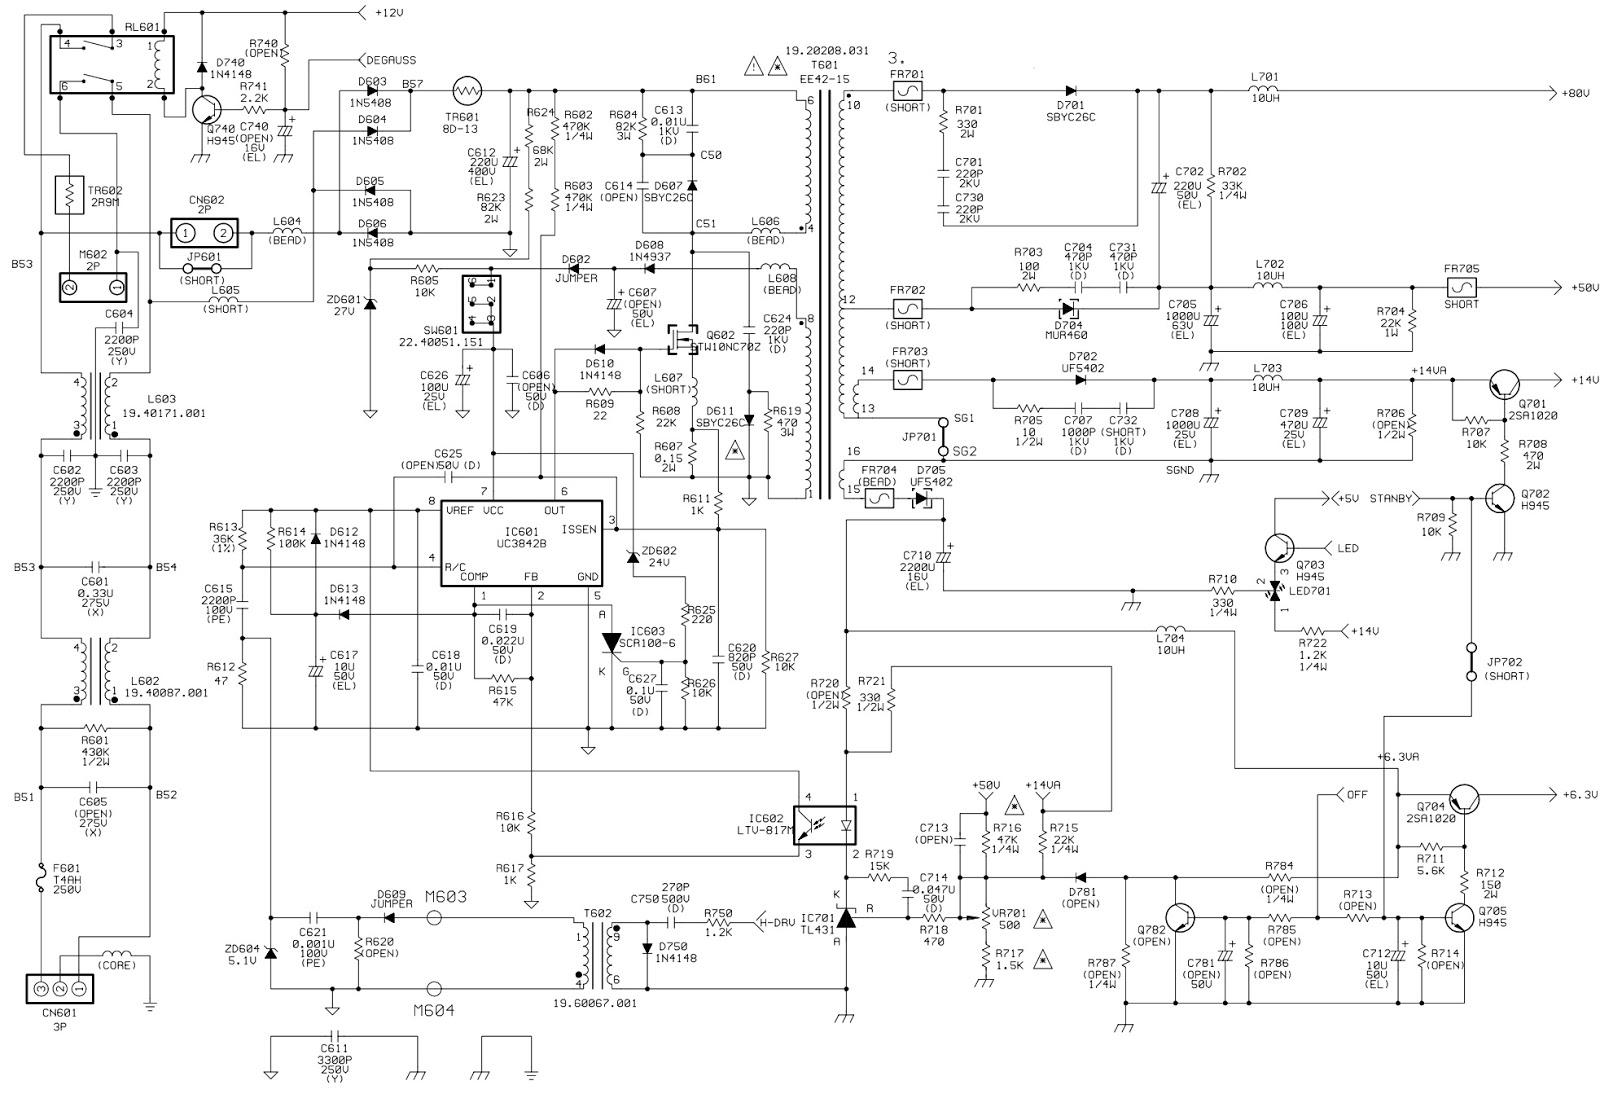 Electro help: LG PLASMA TV LG  LG42PM1M TROUBLESHOOTING